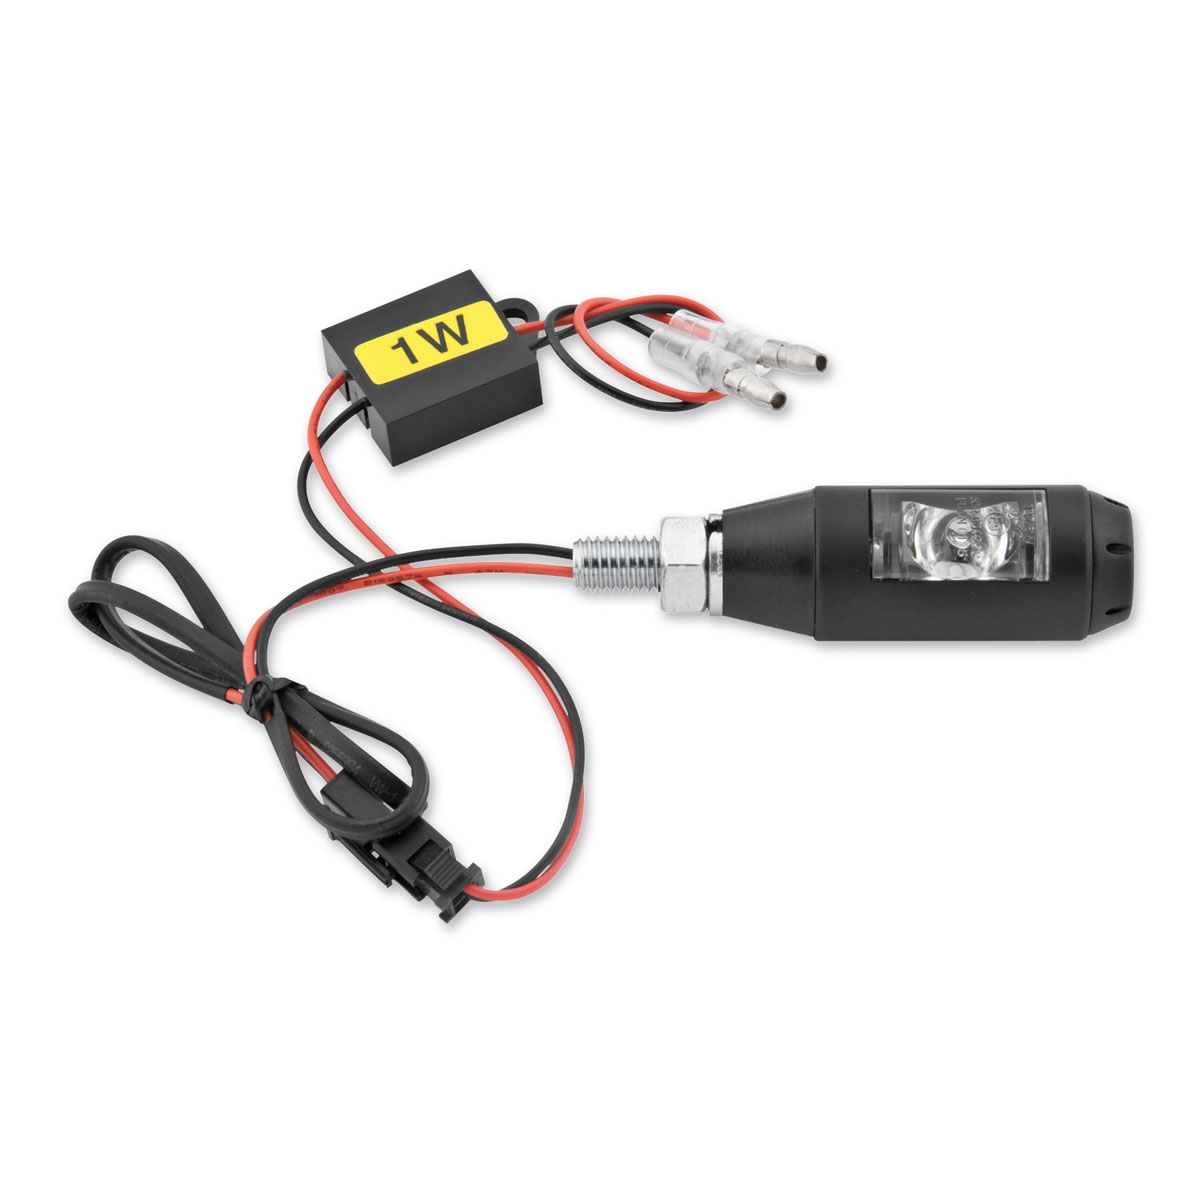 BikeMaster Matte Black Snubnose Turn Signals with Resistors